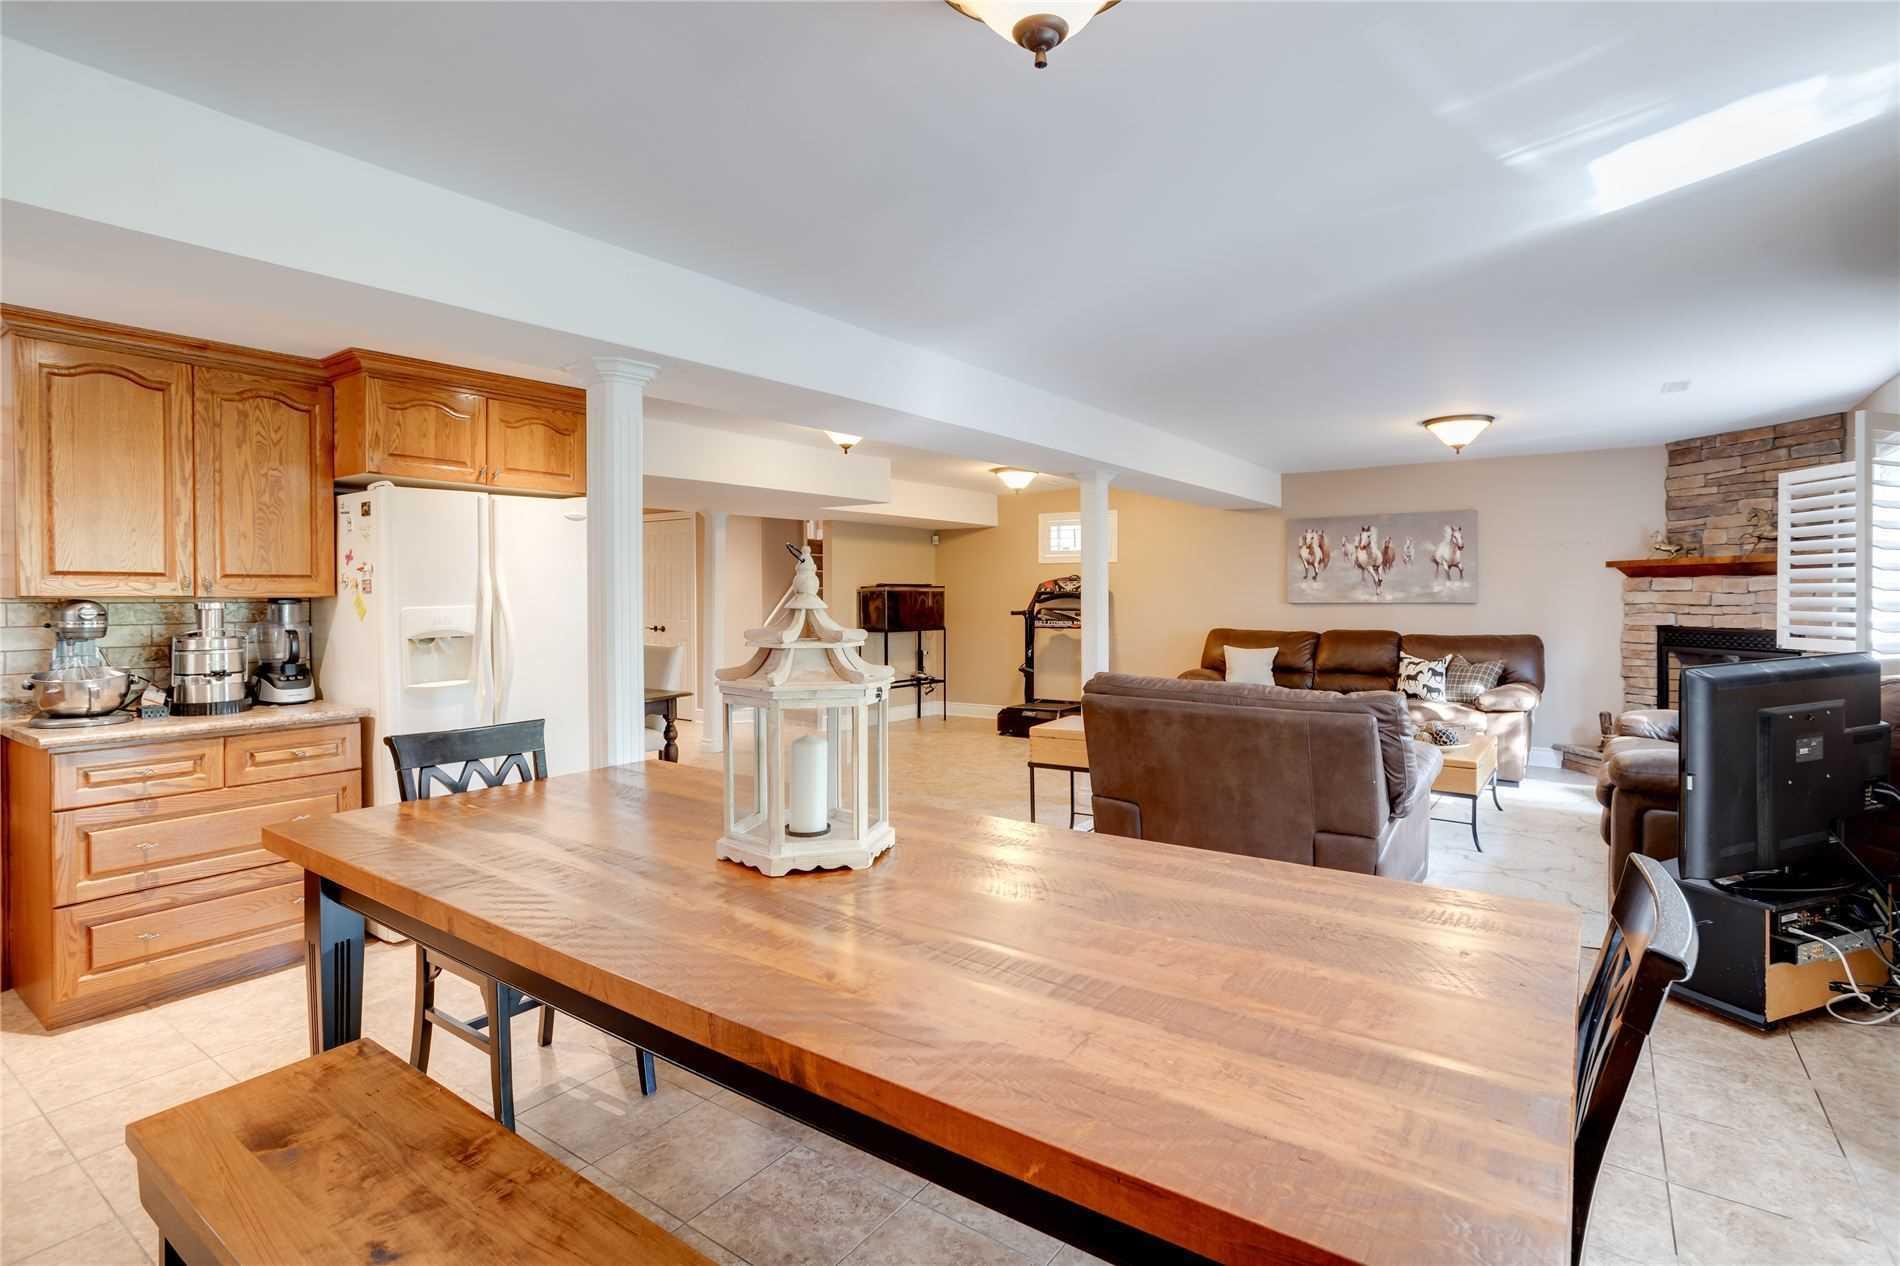 47 Rolling Hills Ln | House 成交價 | Realmaster.com